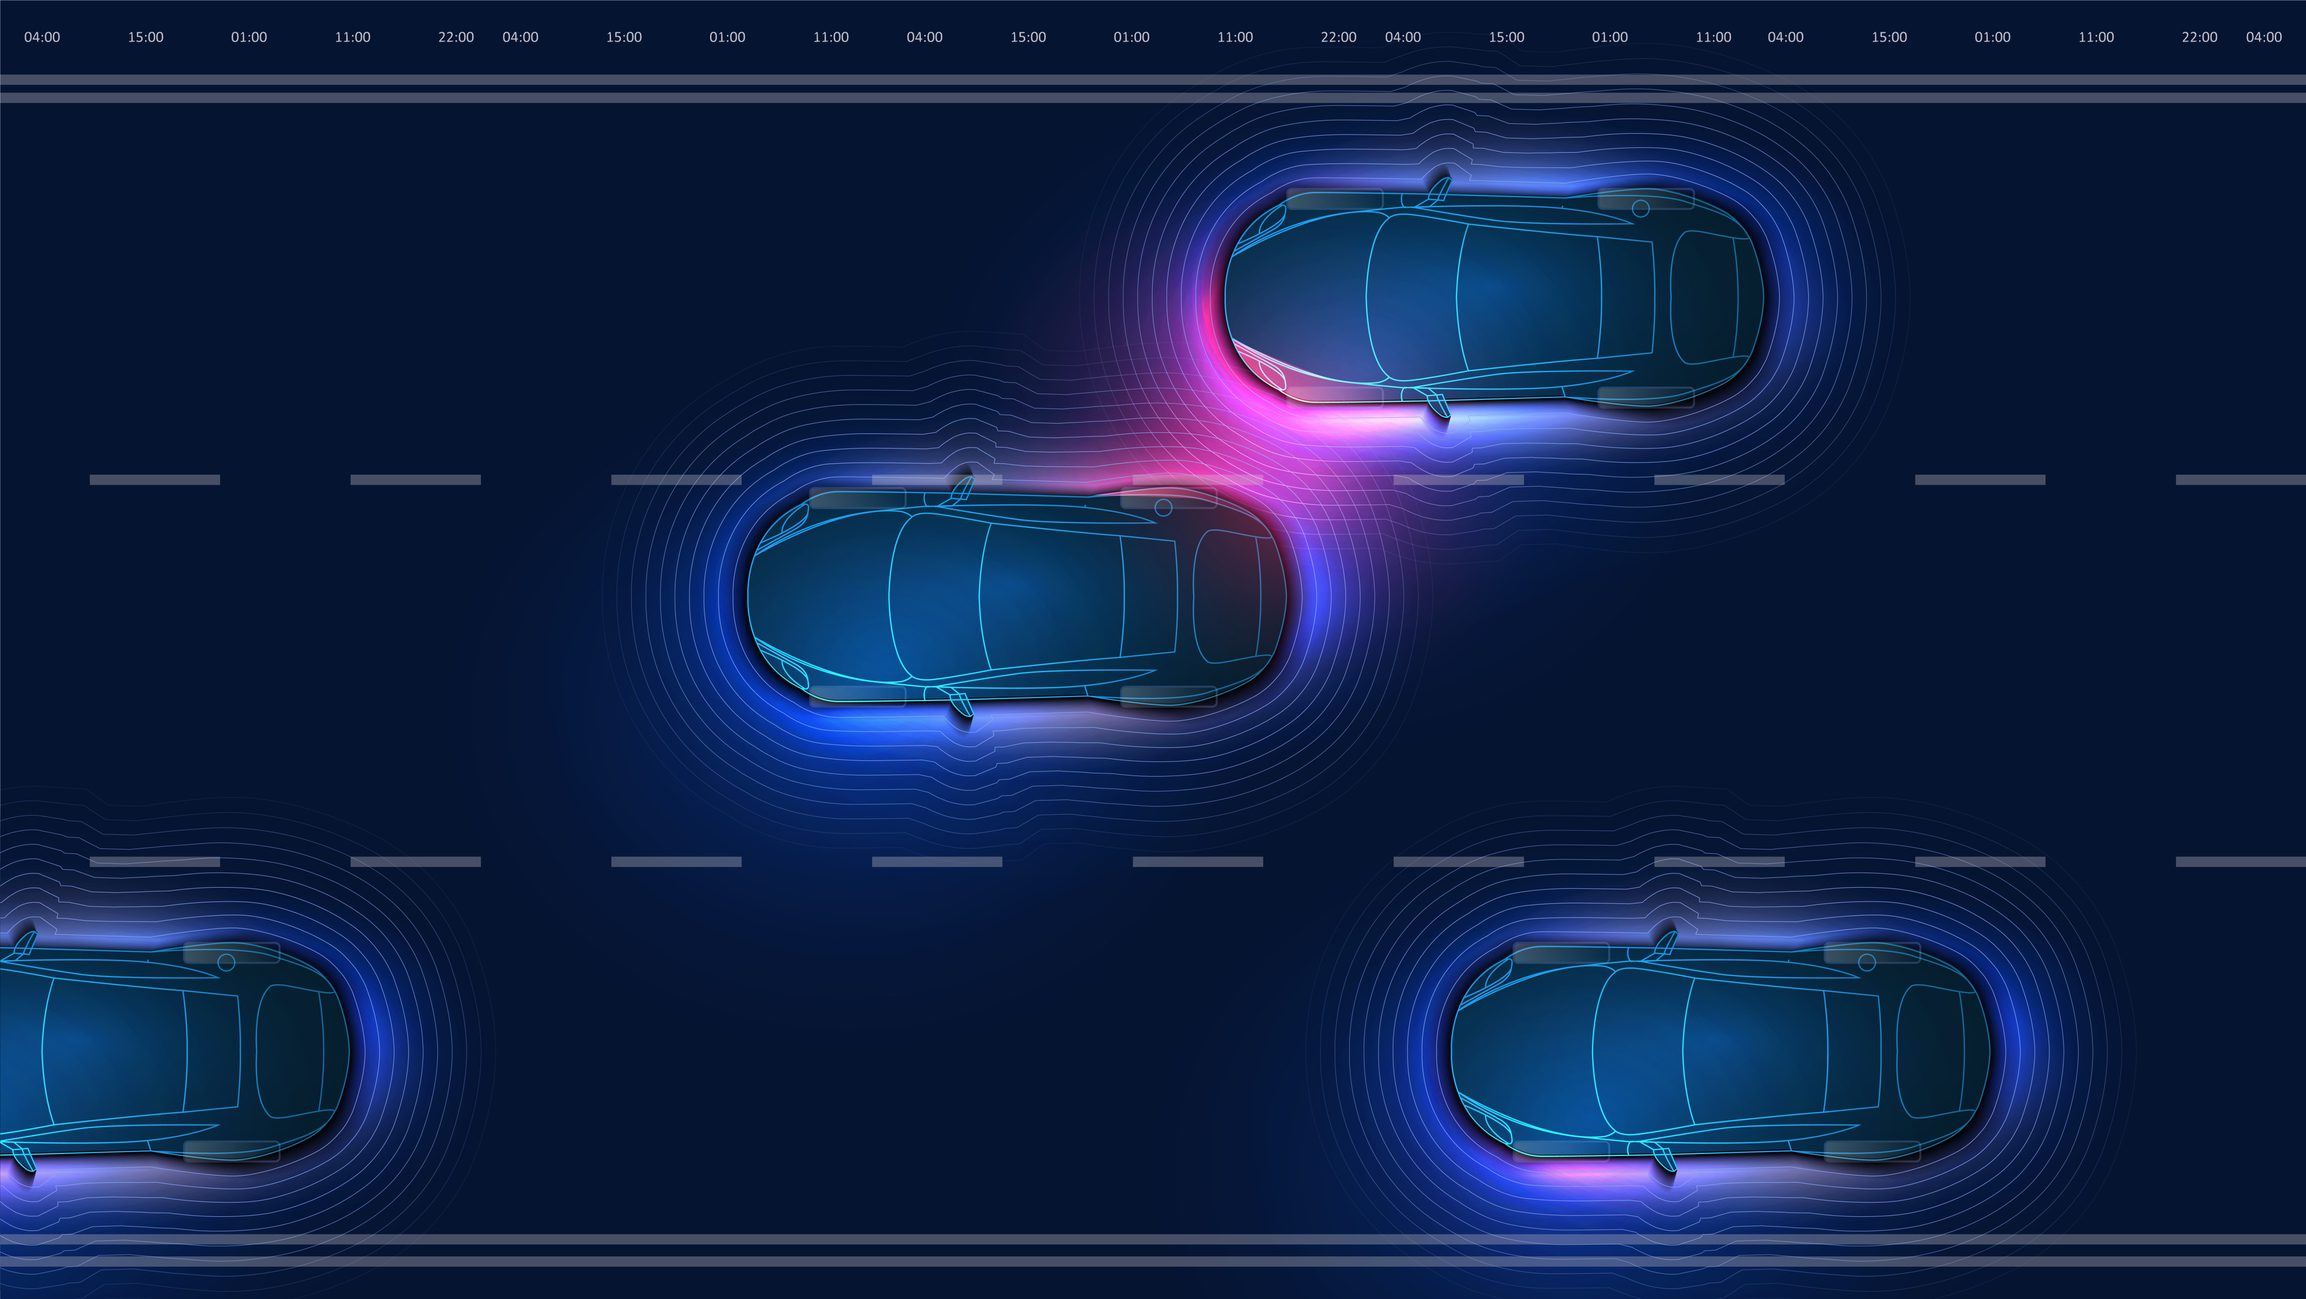 Autonomous vehicles are a coming trend for senior living